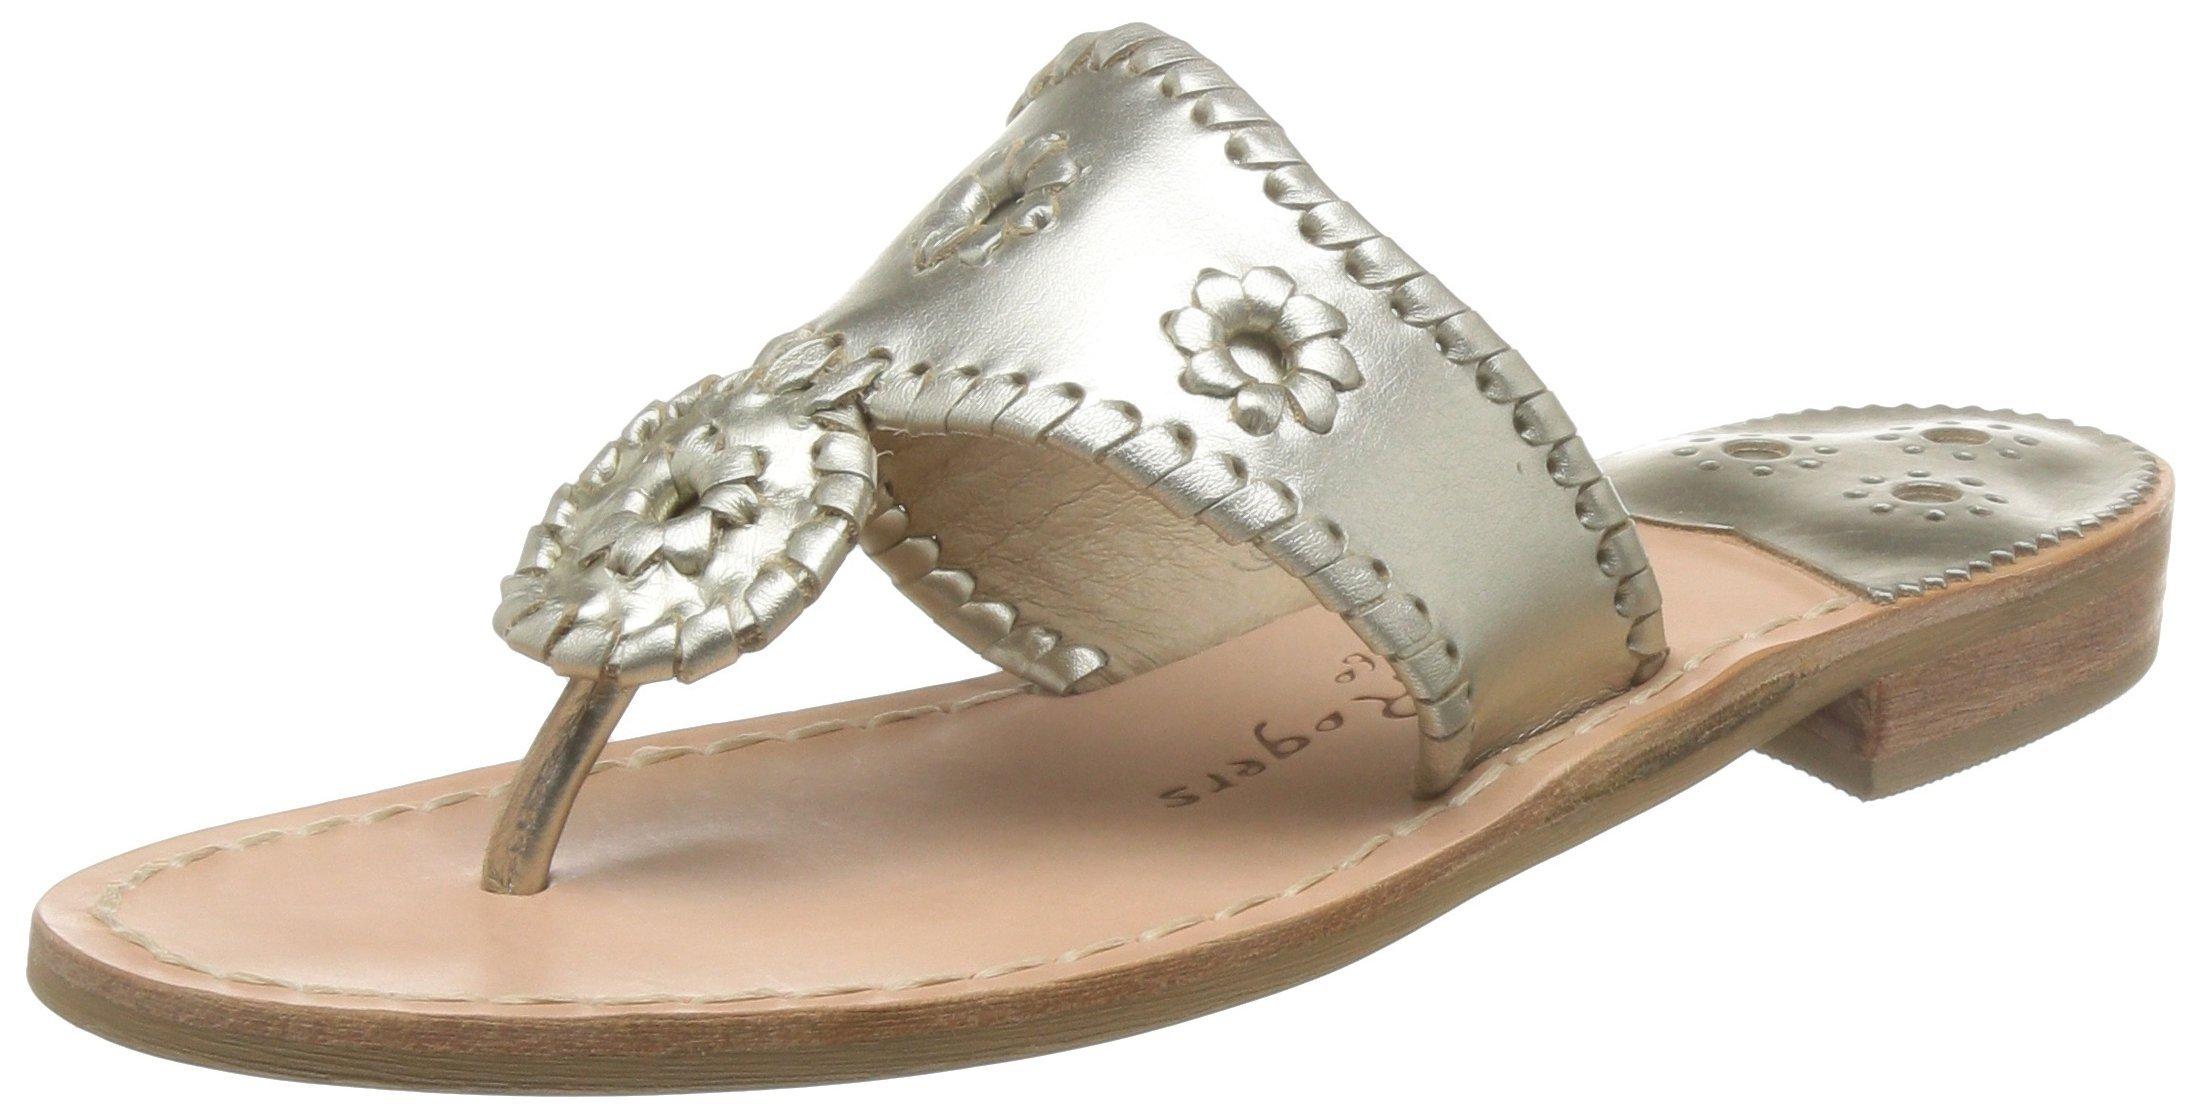 Jack Rogers Women's Hamptons Sandal,Platinum,8 M